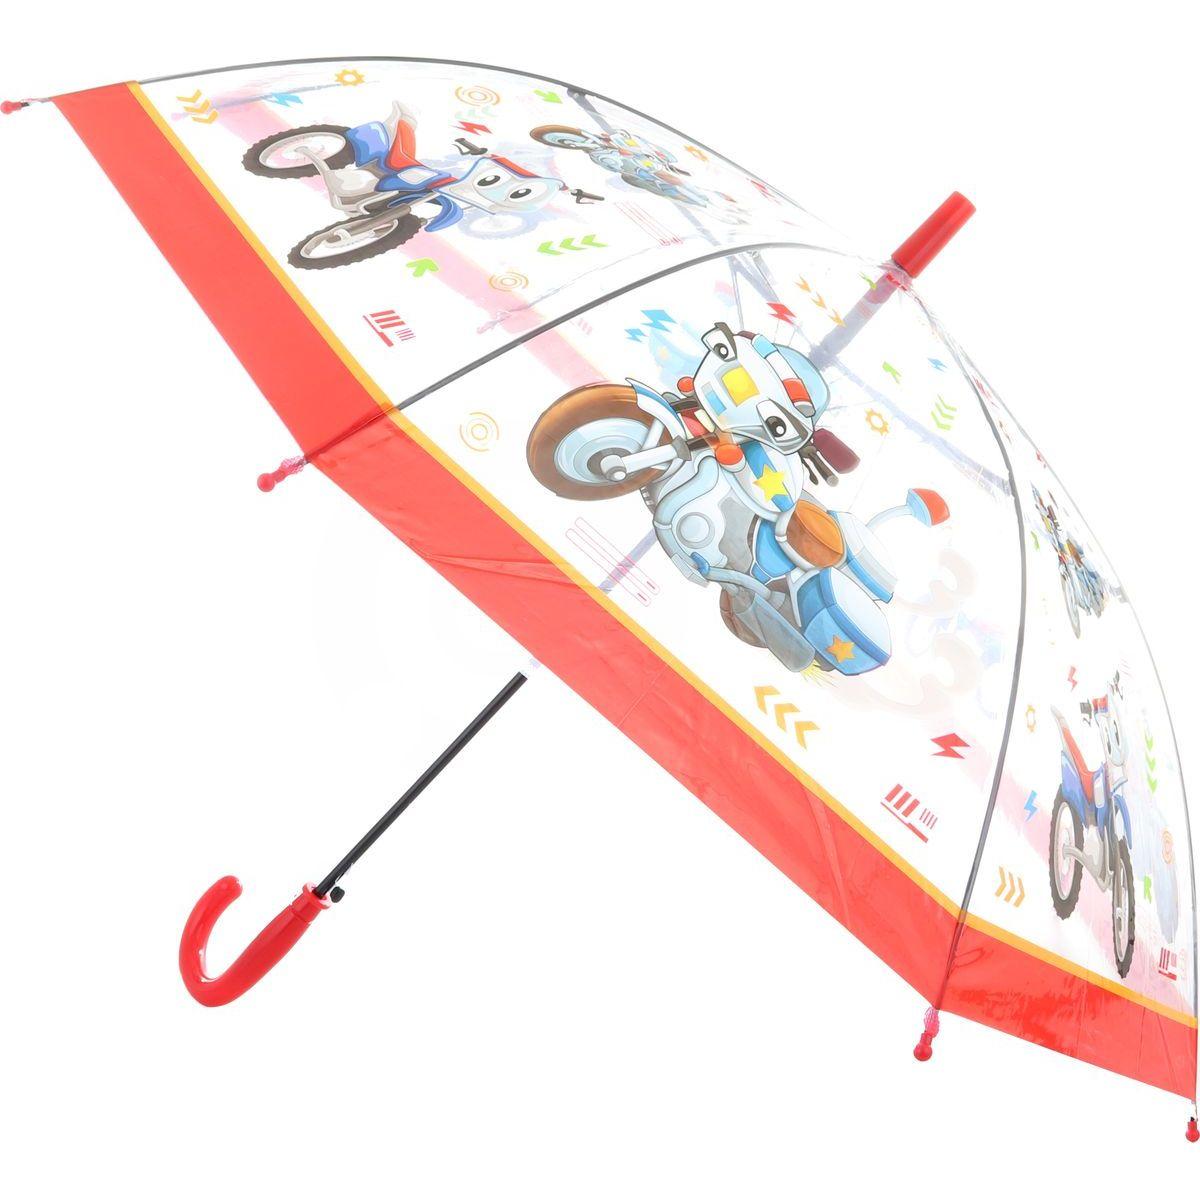 Dáždnik dopravné prostriedky vystreľovací červený